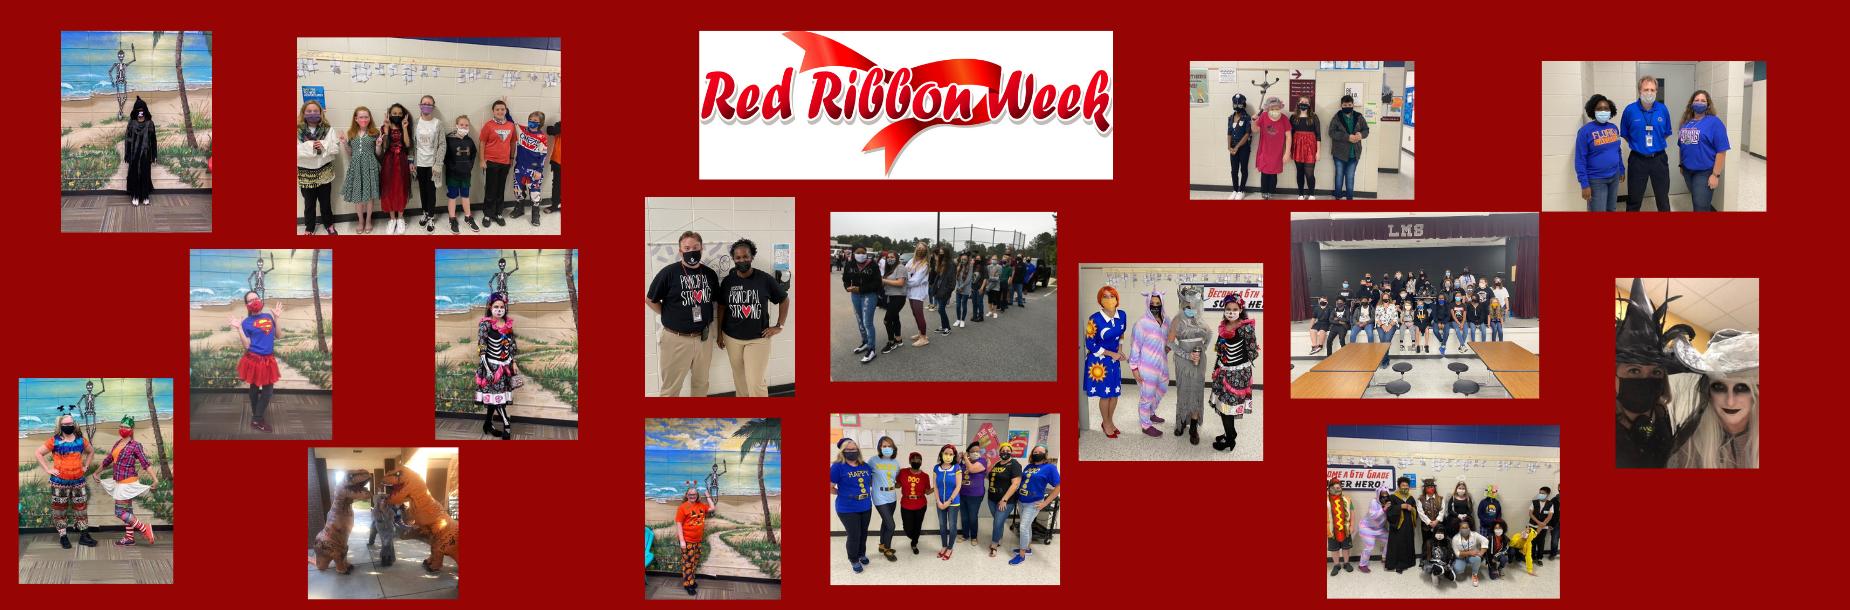 red ribbon week photos